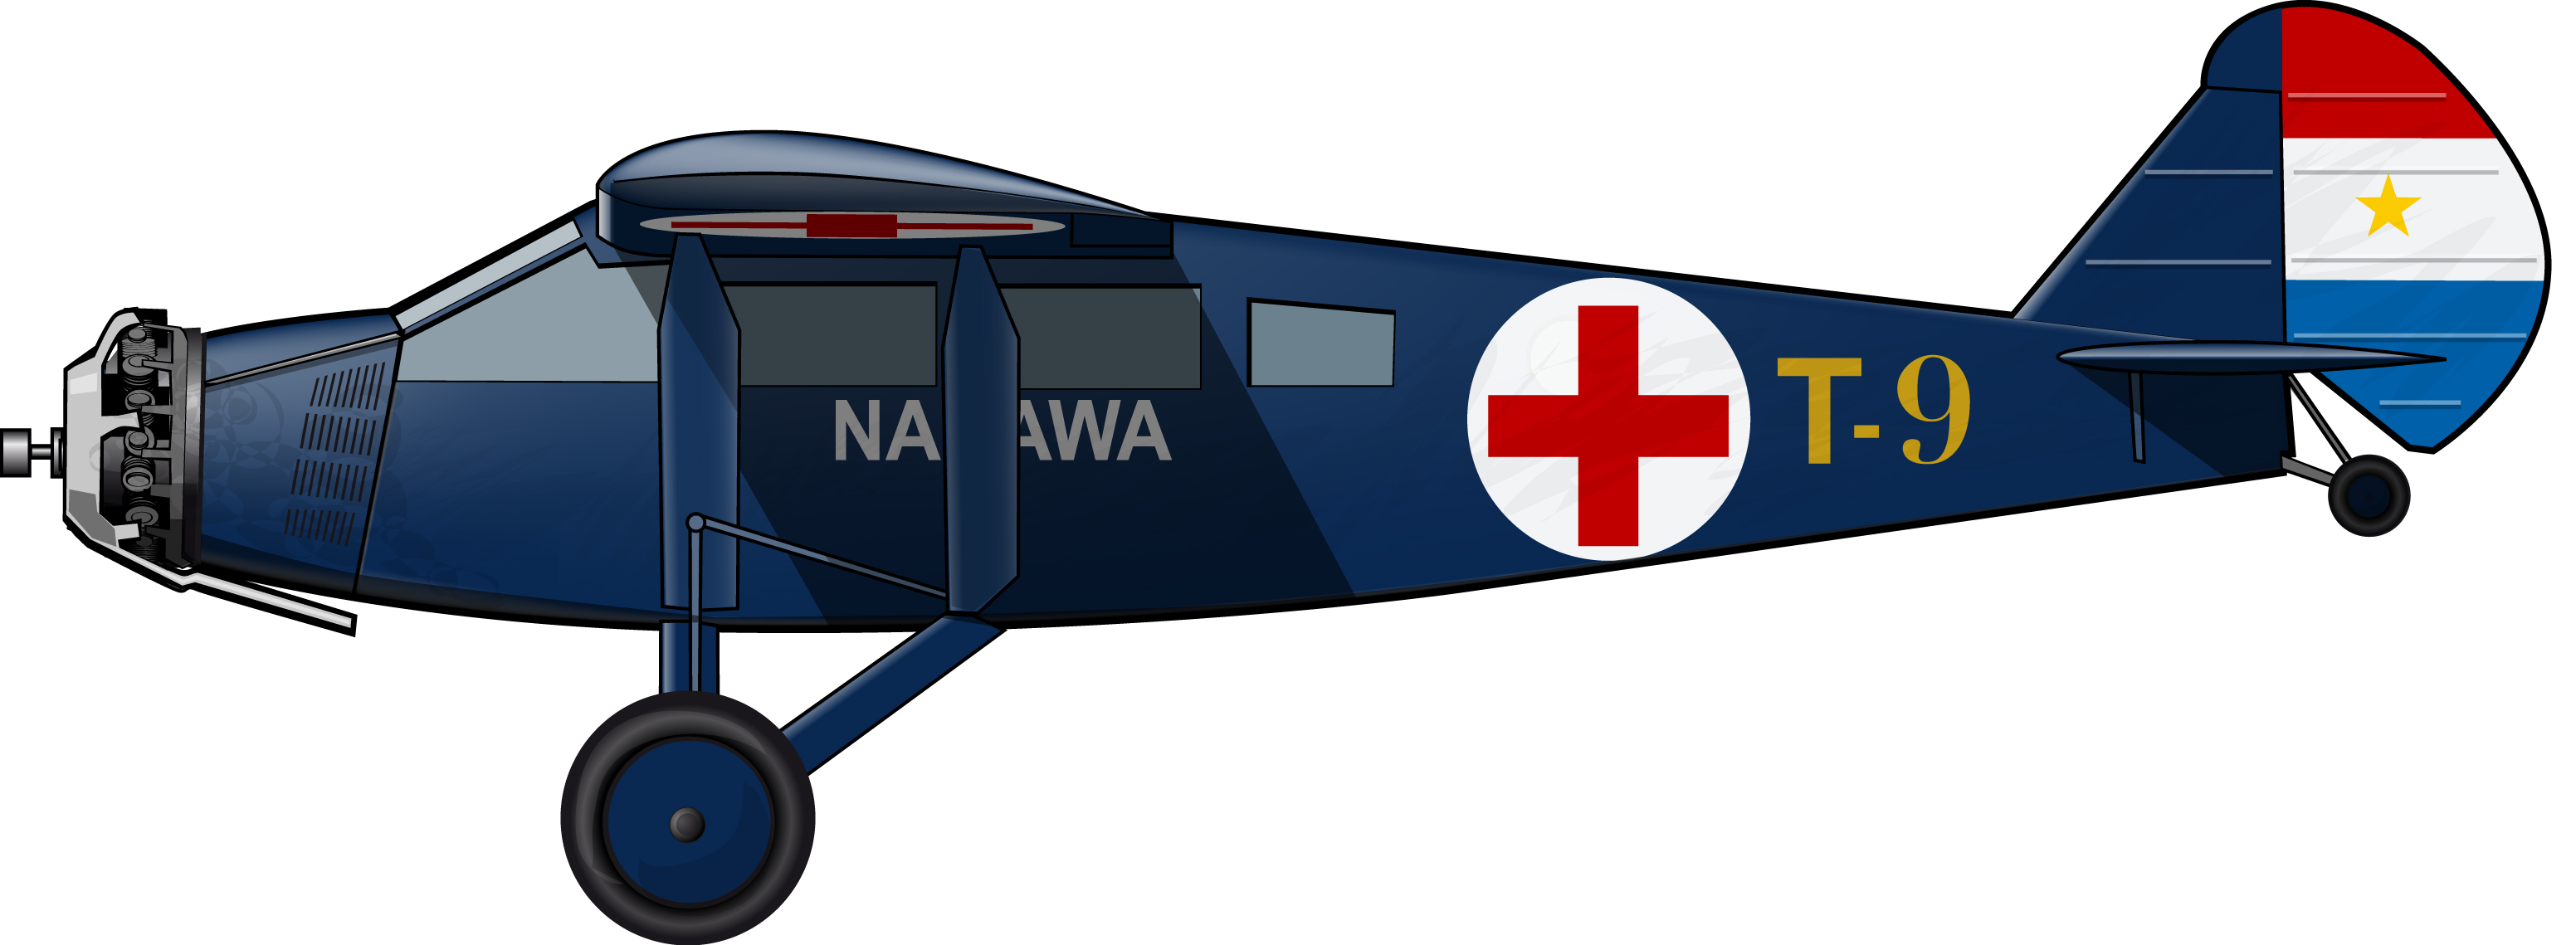 travelair6000paraguay1933